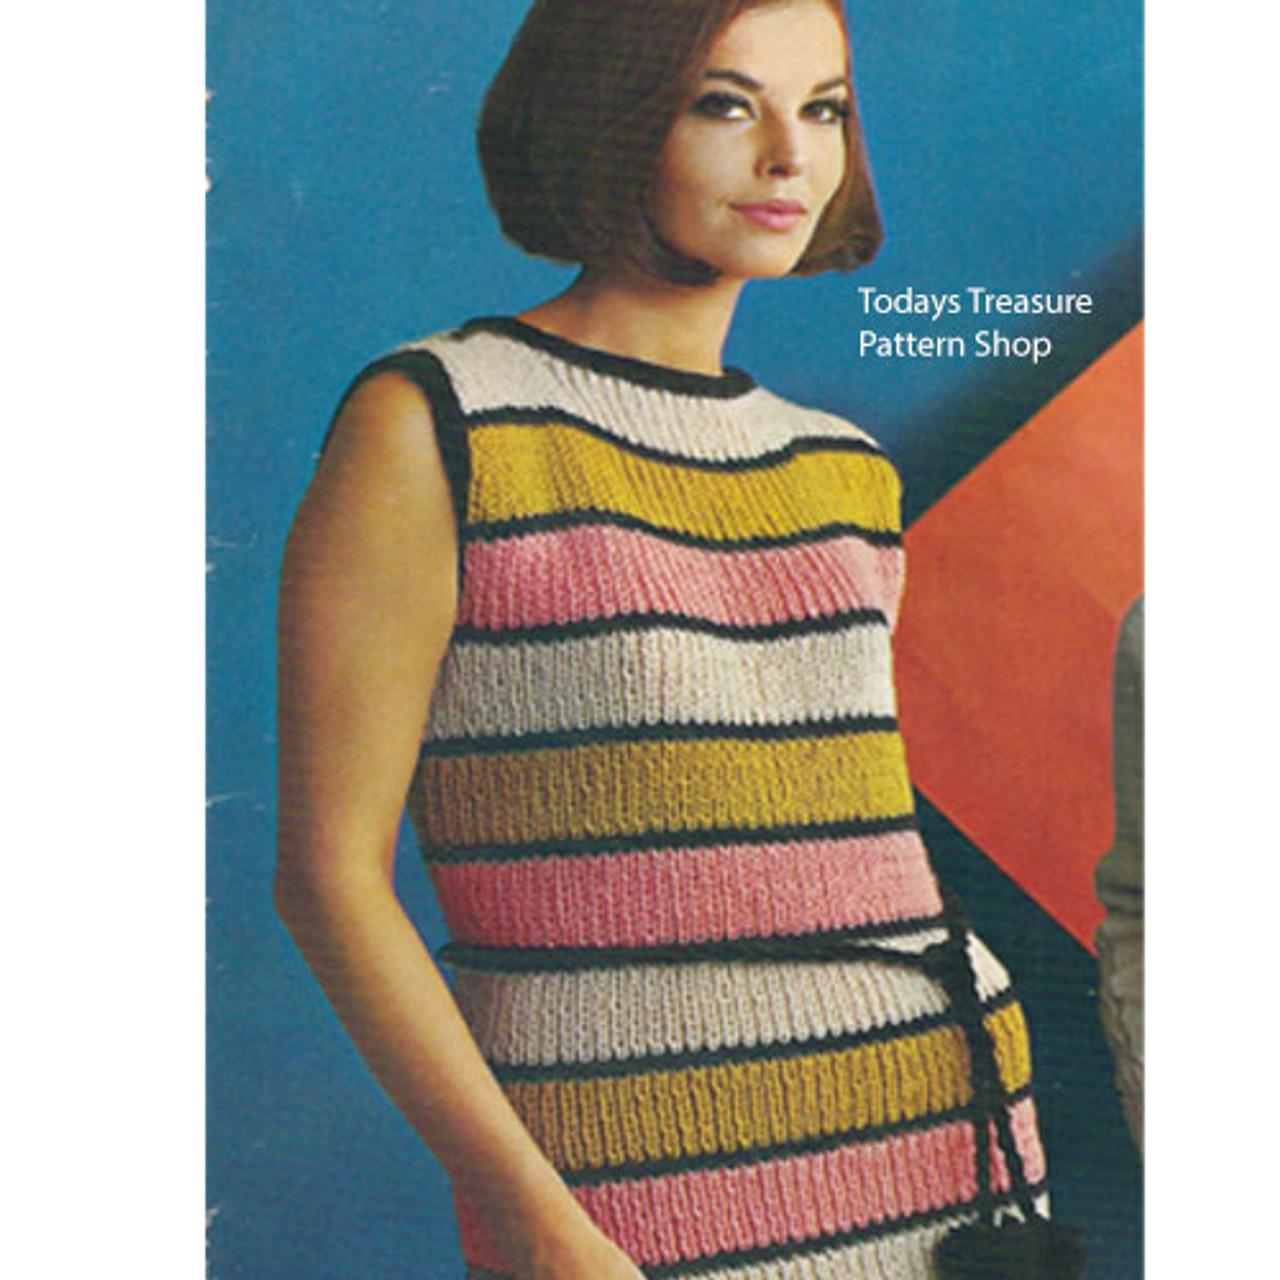 Vintage Striped Sheath Dress Knitting Pattern